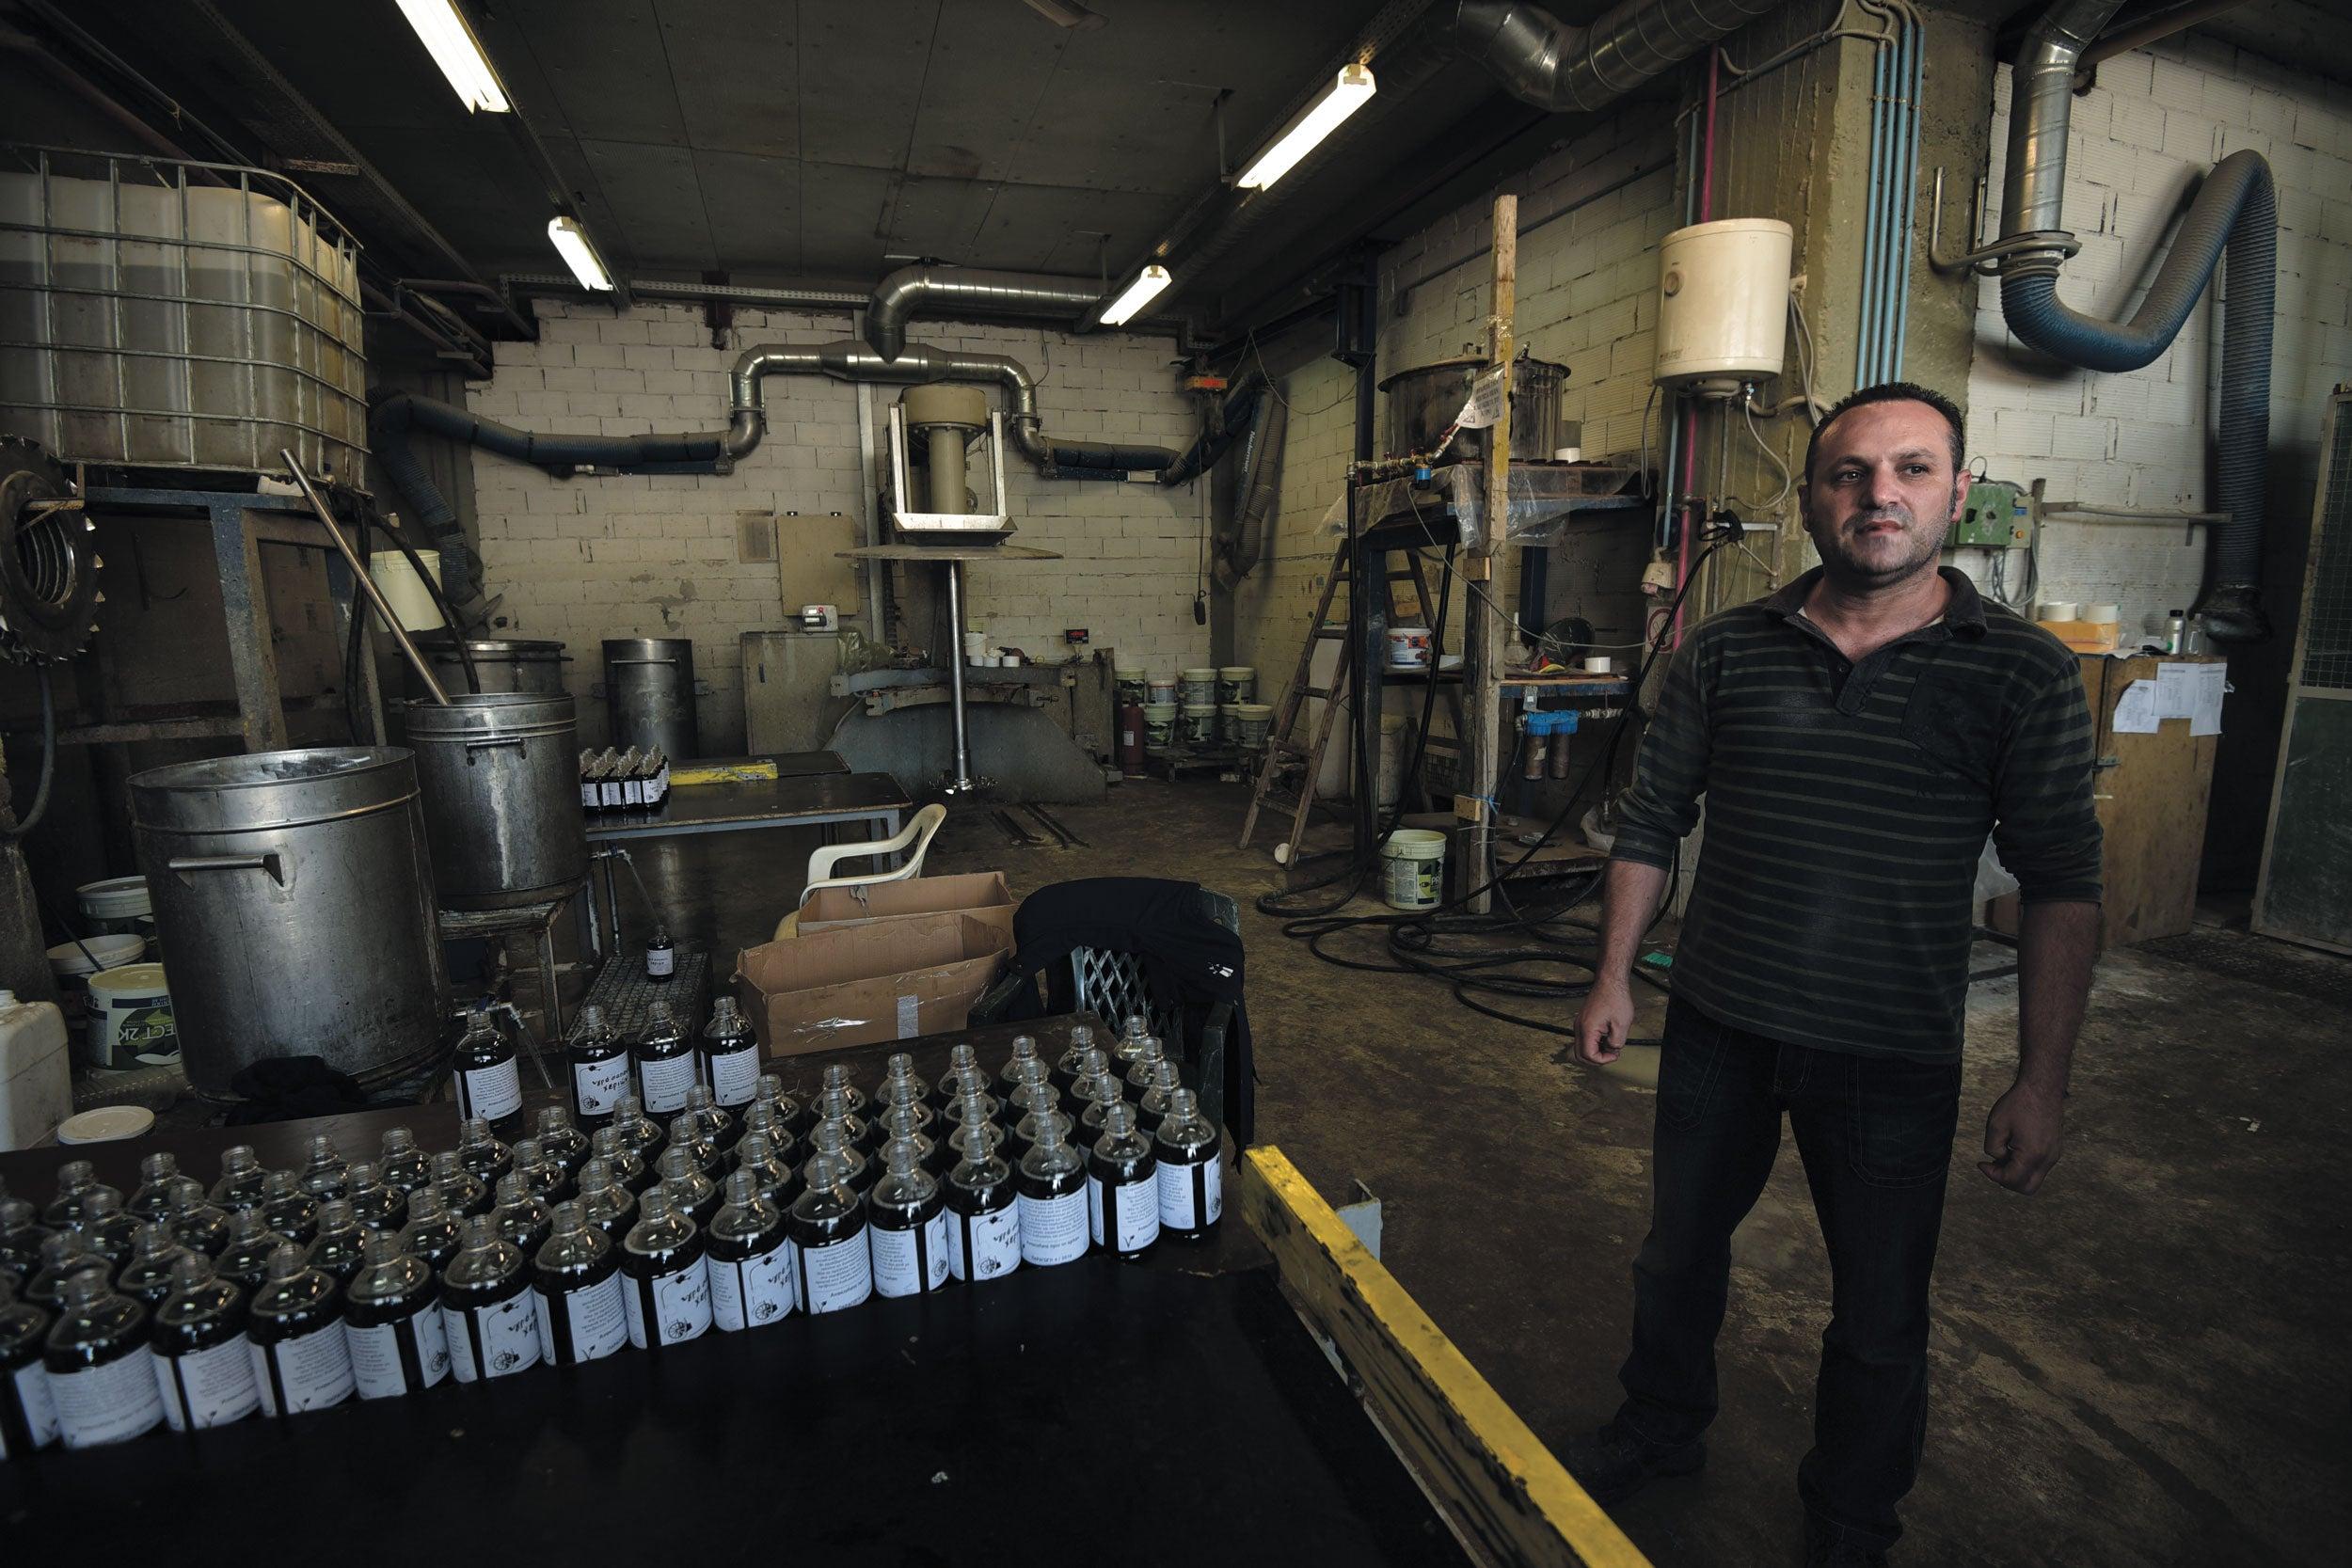 Dimitris Koumatsioulis standing inside a an eco-friendly detergent factory in Thessaloniki, Greece.